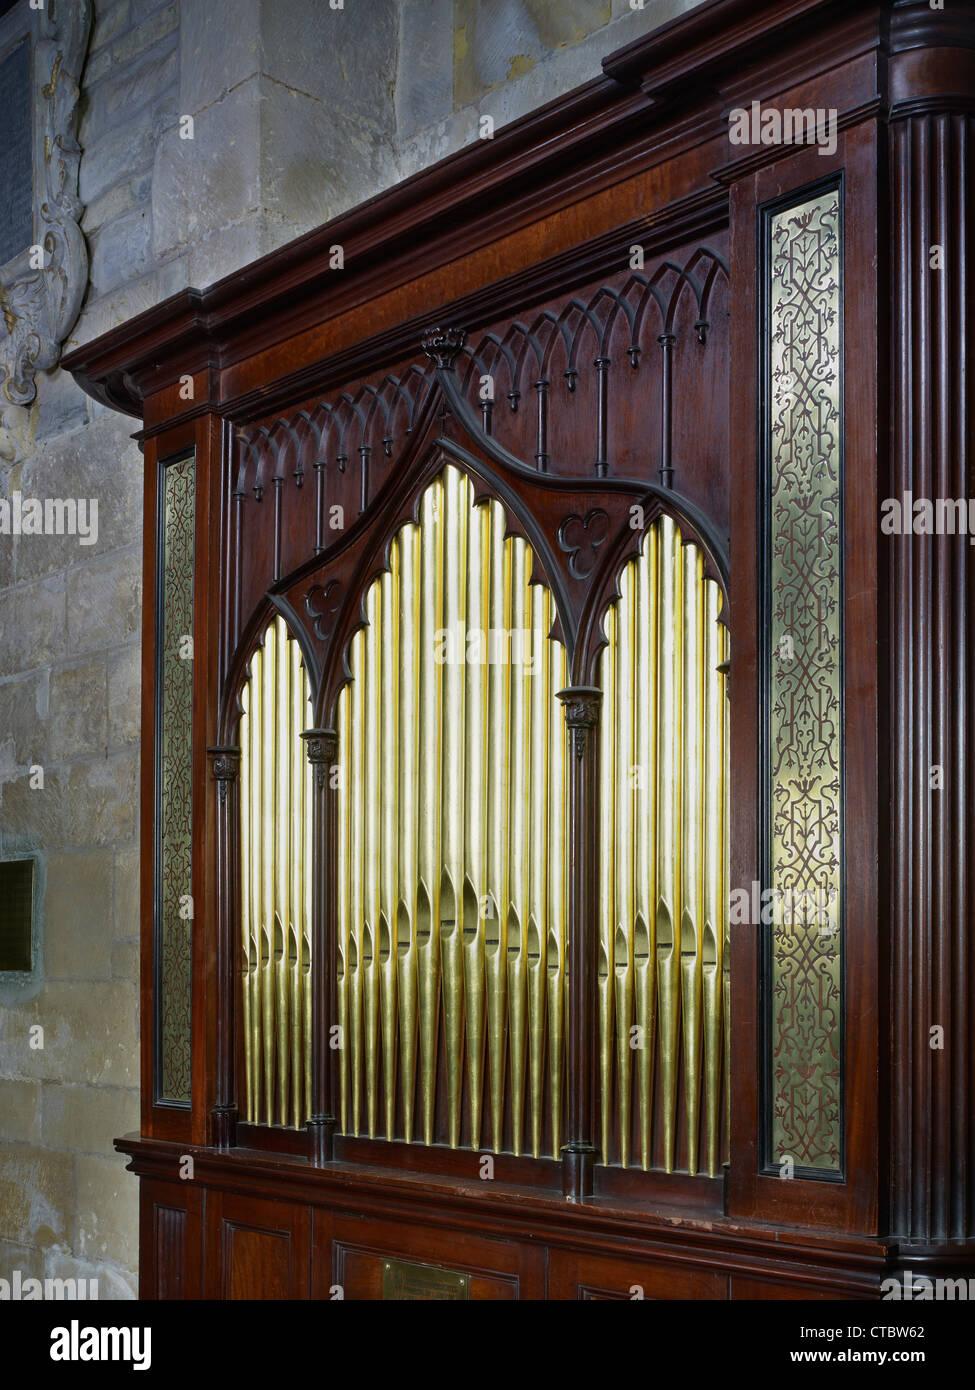 Kleine aus dem 18. Jahrhundert Orgel Tewkesbury Abbey Stockbild